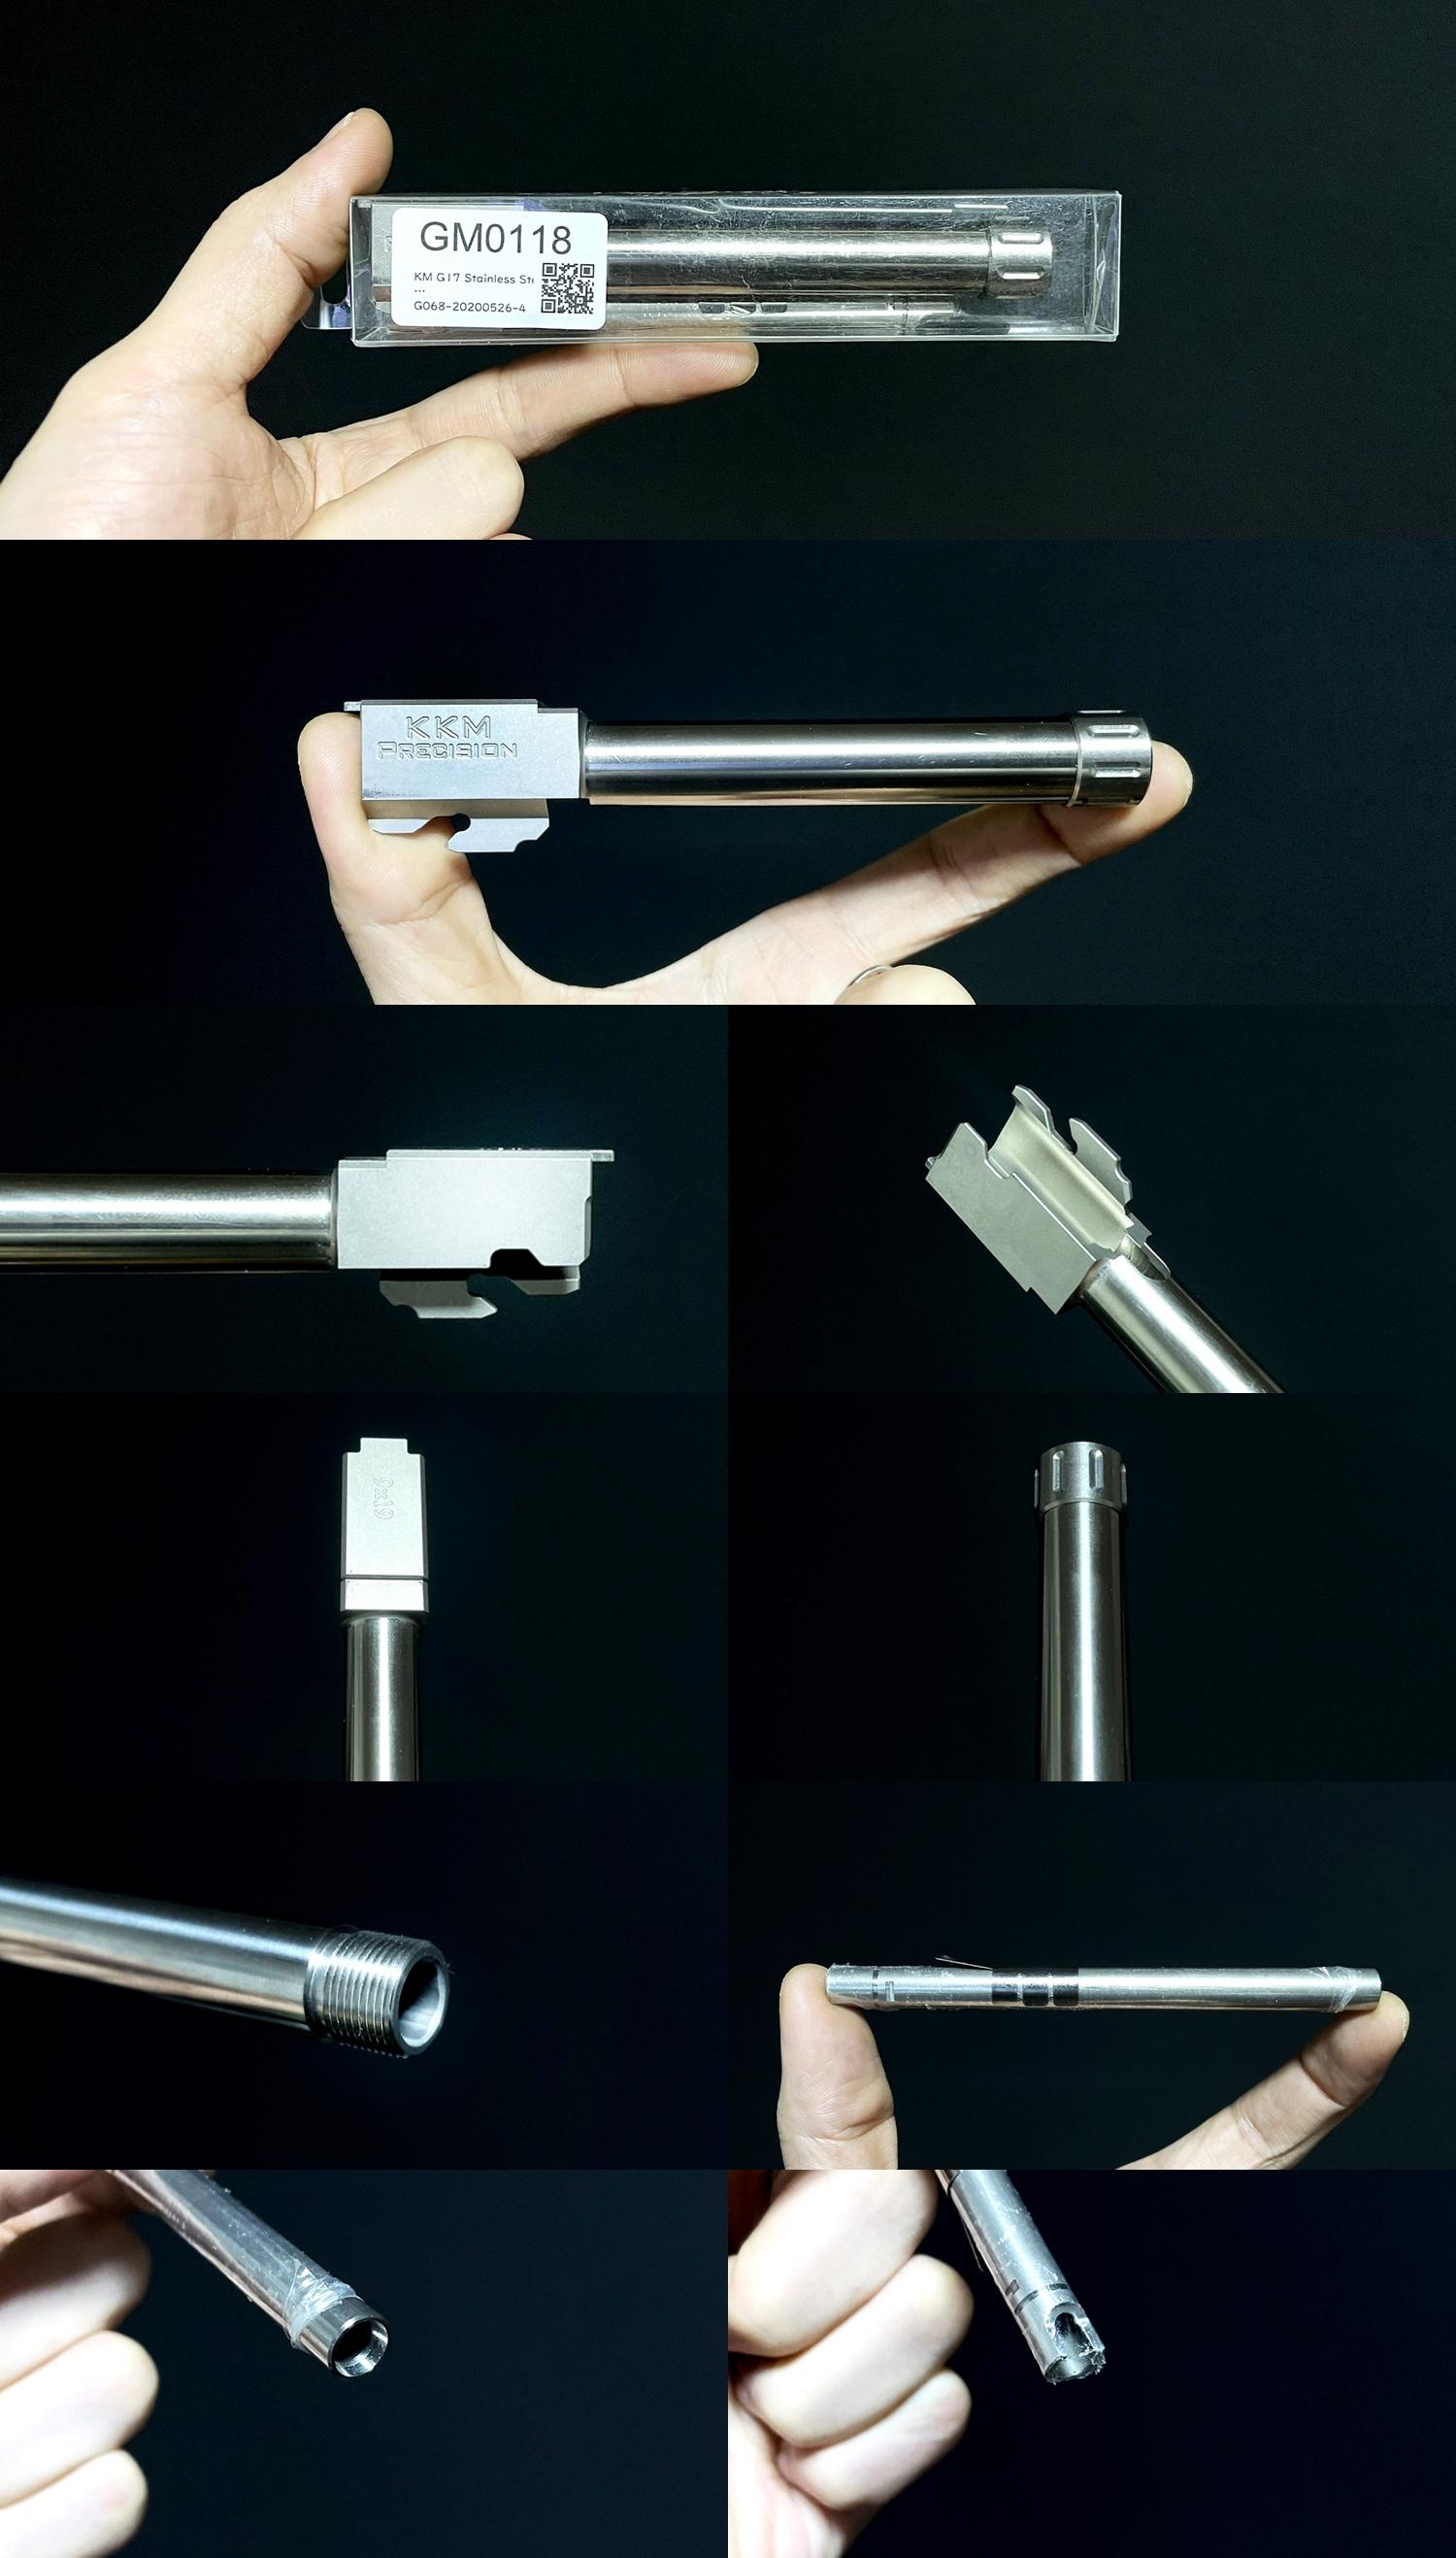 1 Guns Modify KKM PRECISION GLOCK ステンレスアウターバレル 東京マルイ G17 G18C GBB GET! リアルで重量感あるCNC 精密切り出し加工! BARREL+PROTECTOR+ショートリコイルアシストスプリング+インナーバレルセット